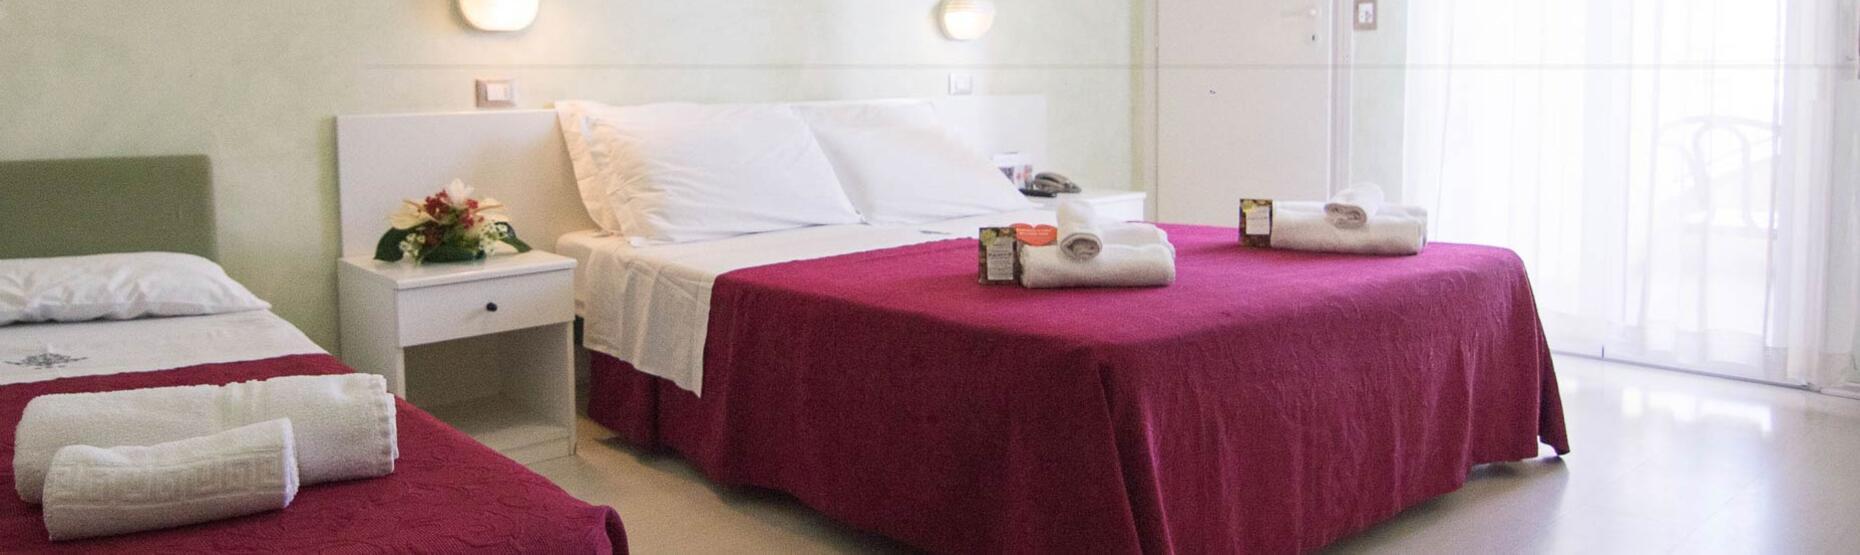 hoteldeiplatani fr eco-hotel 019